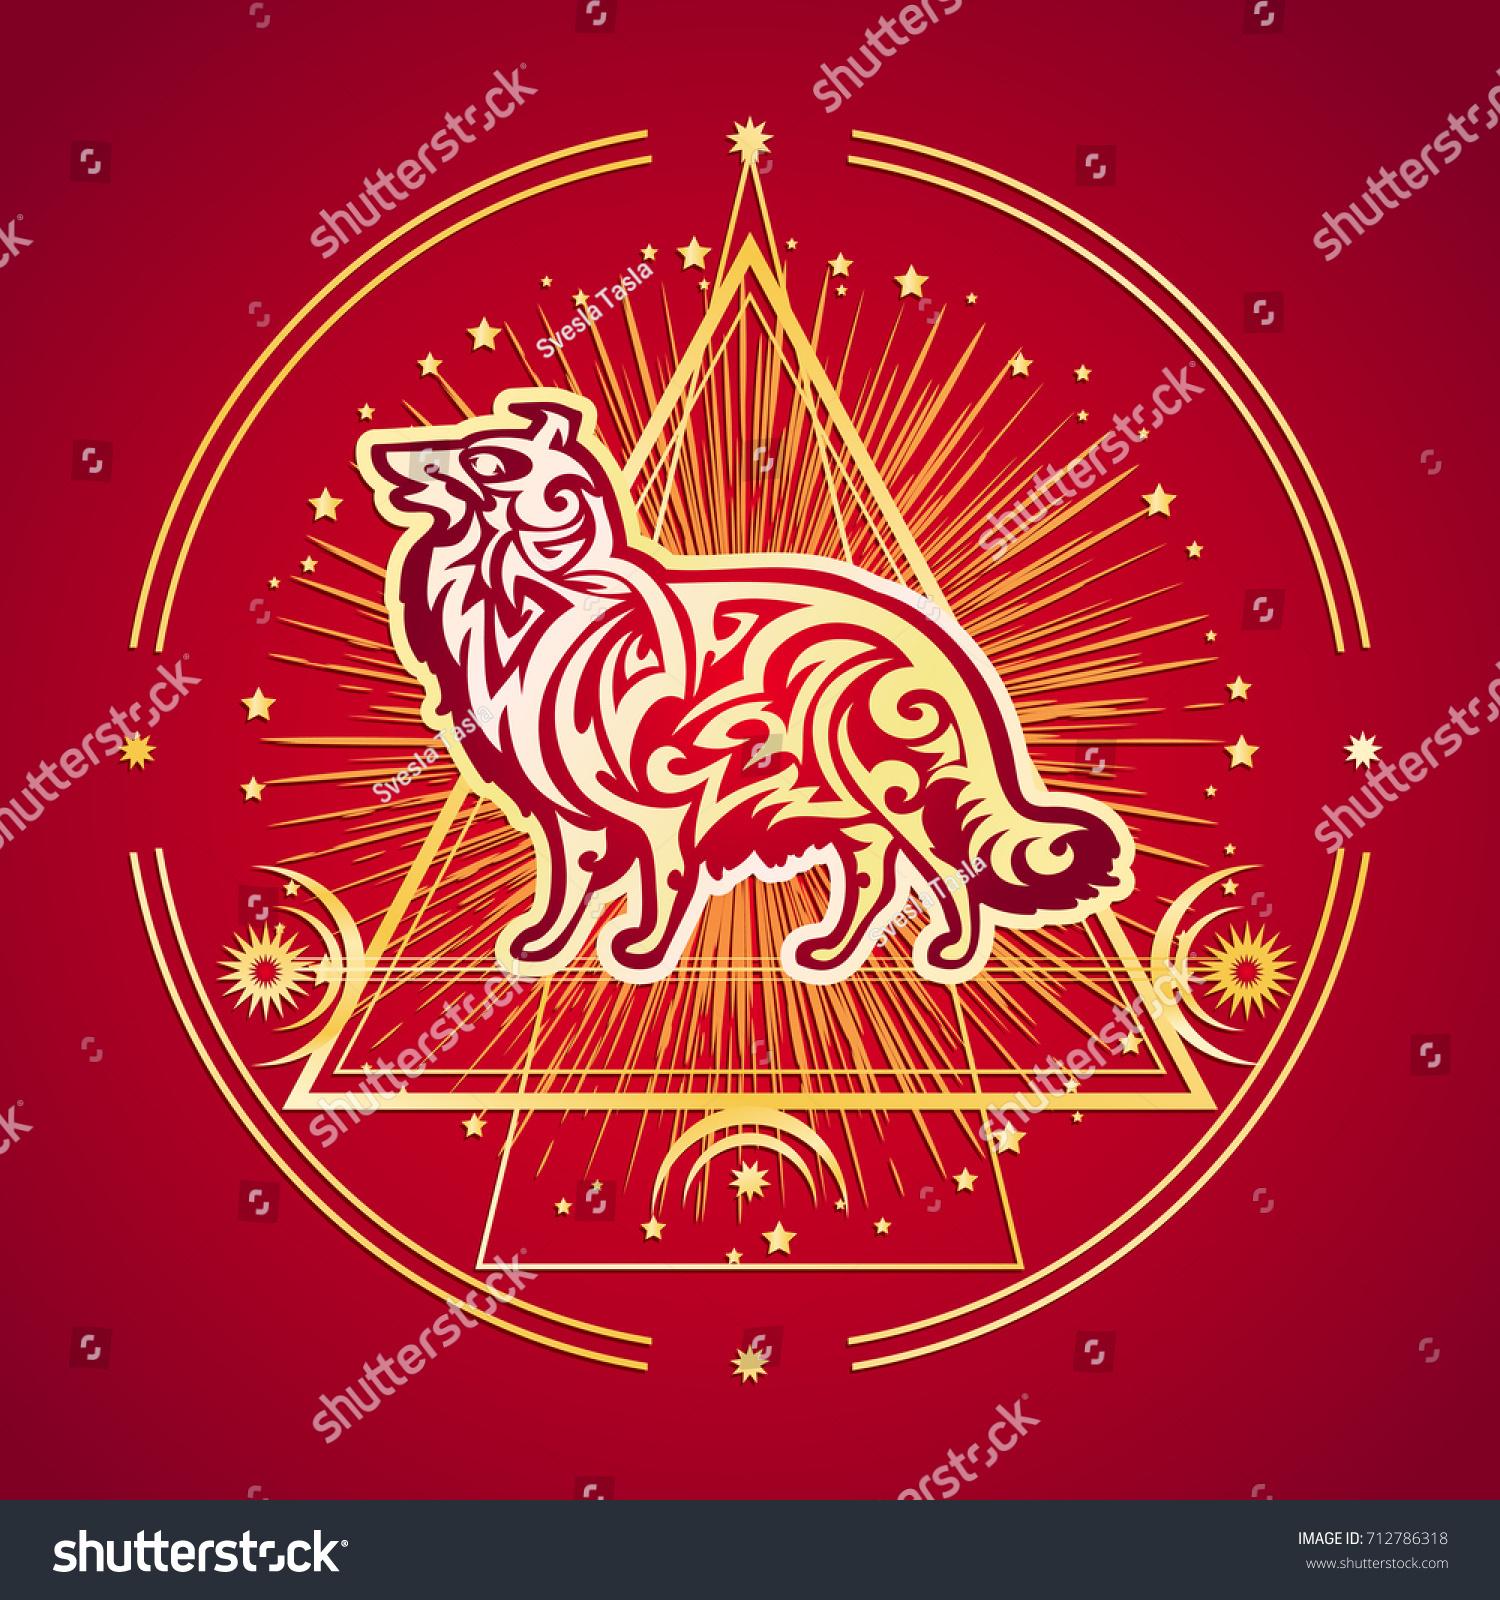 Dog year chinese zodiac esoteric symbol stock vector 712786318 dog year chinese zodiac esoteric symbol 2018 ethnic tribal astrology print for t shirt biocorpaavc